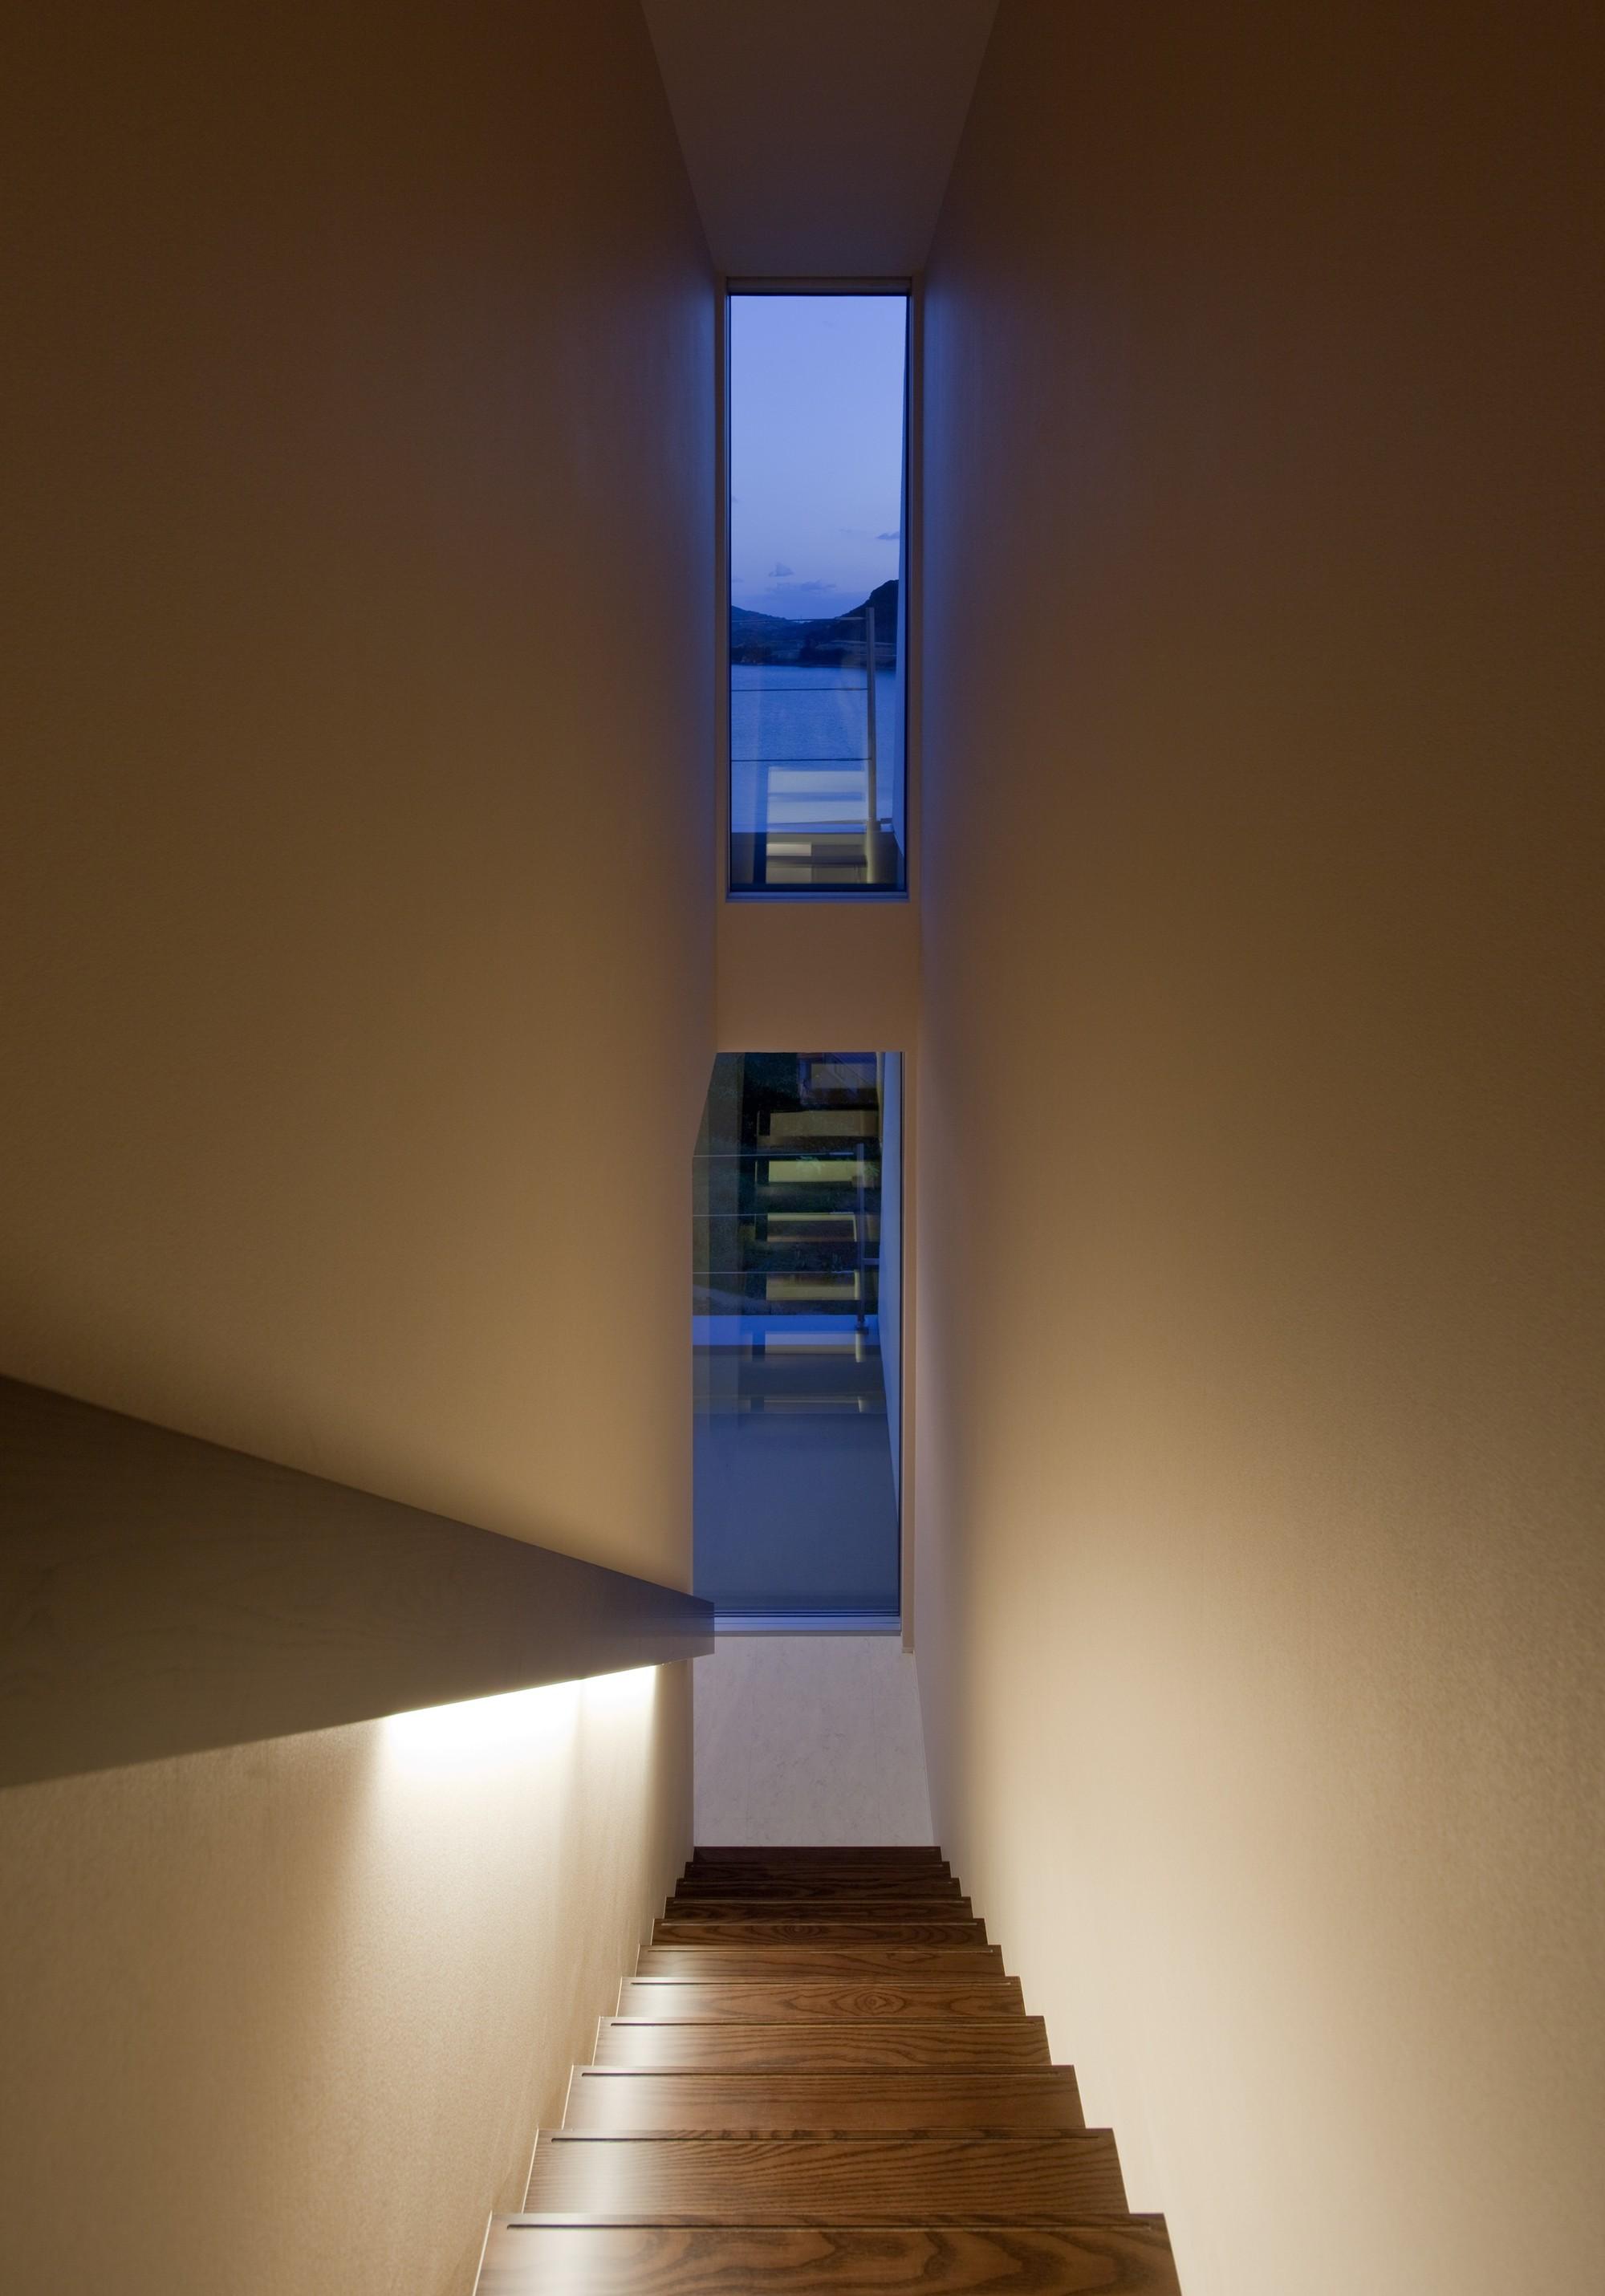 Galeria de i house architecture show 7 - Architecture shows ...